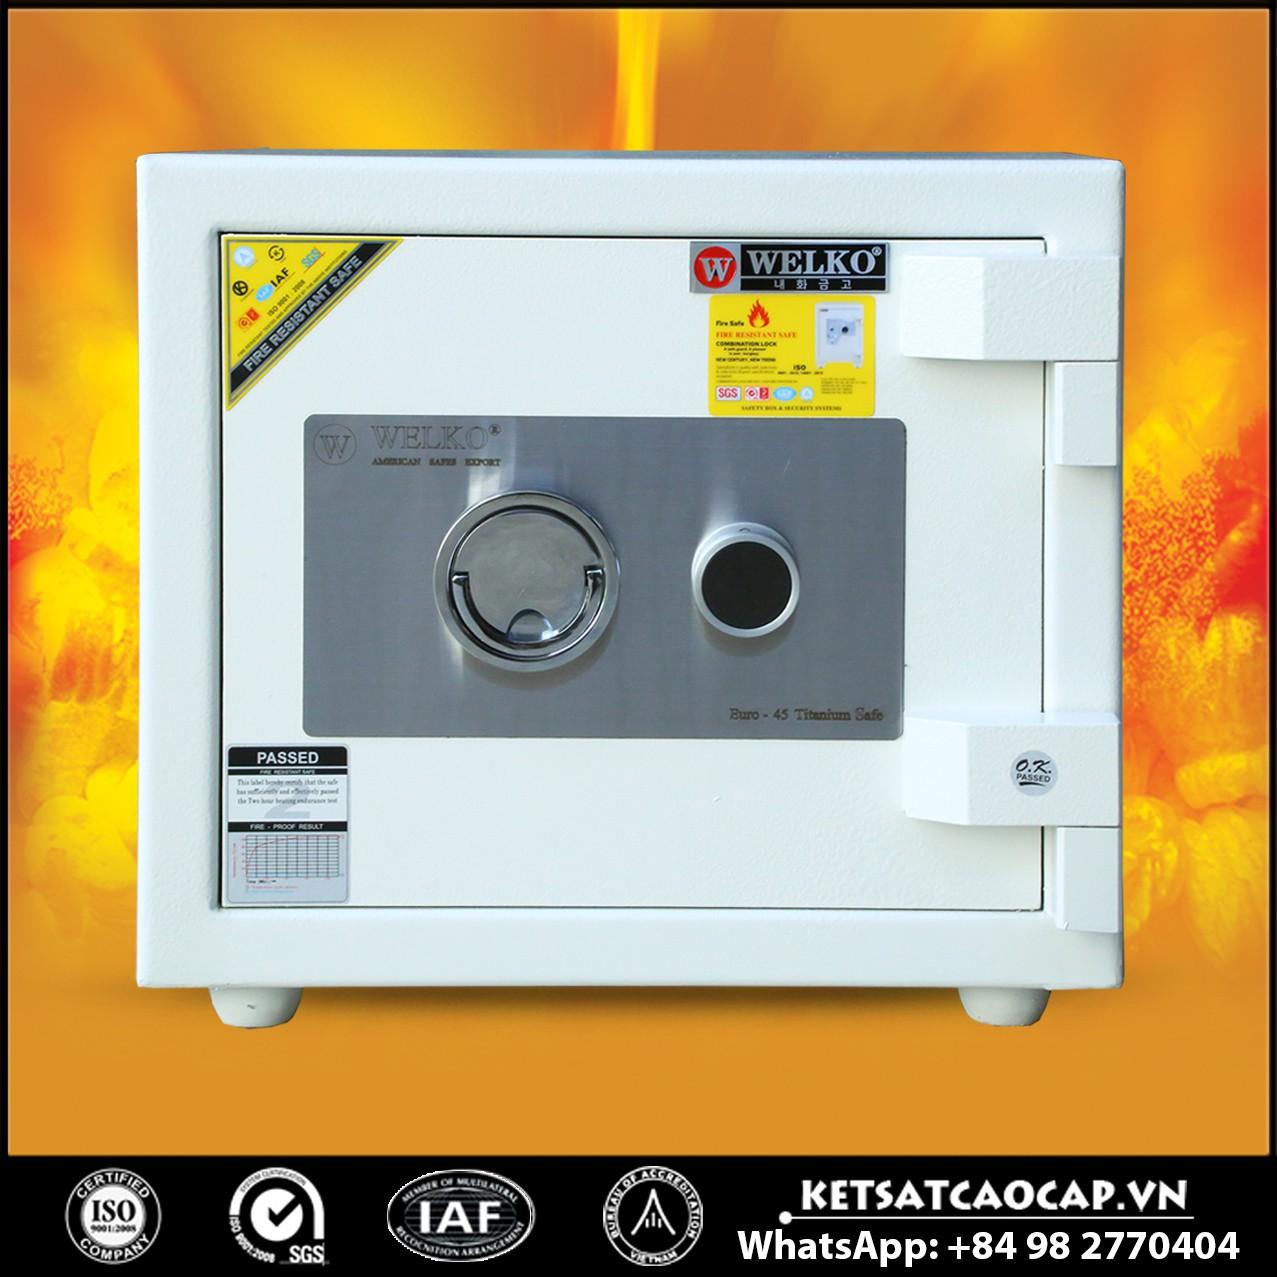 Két Sắt Mini Safes NSA 440 KEY White